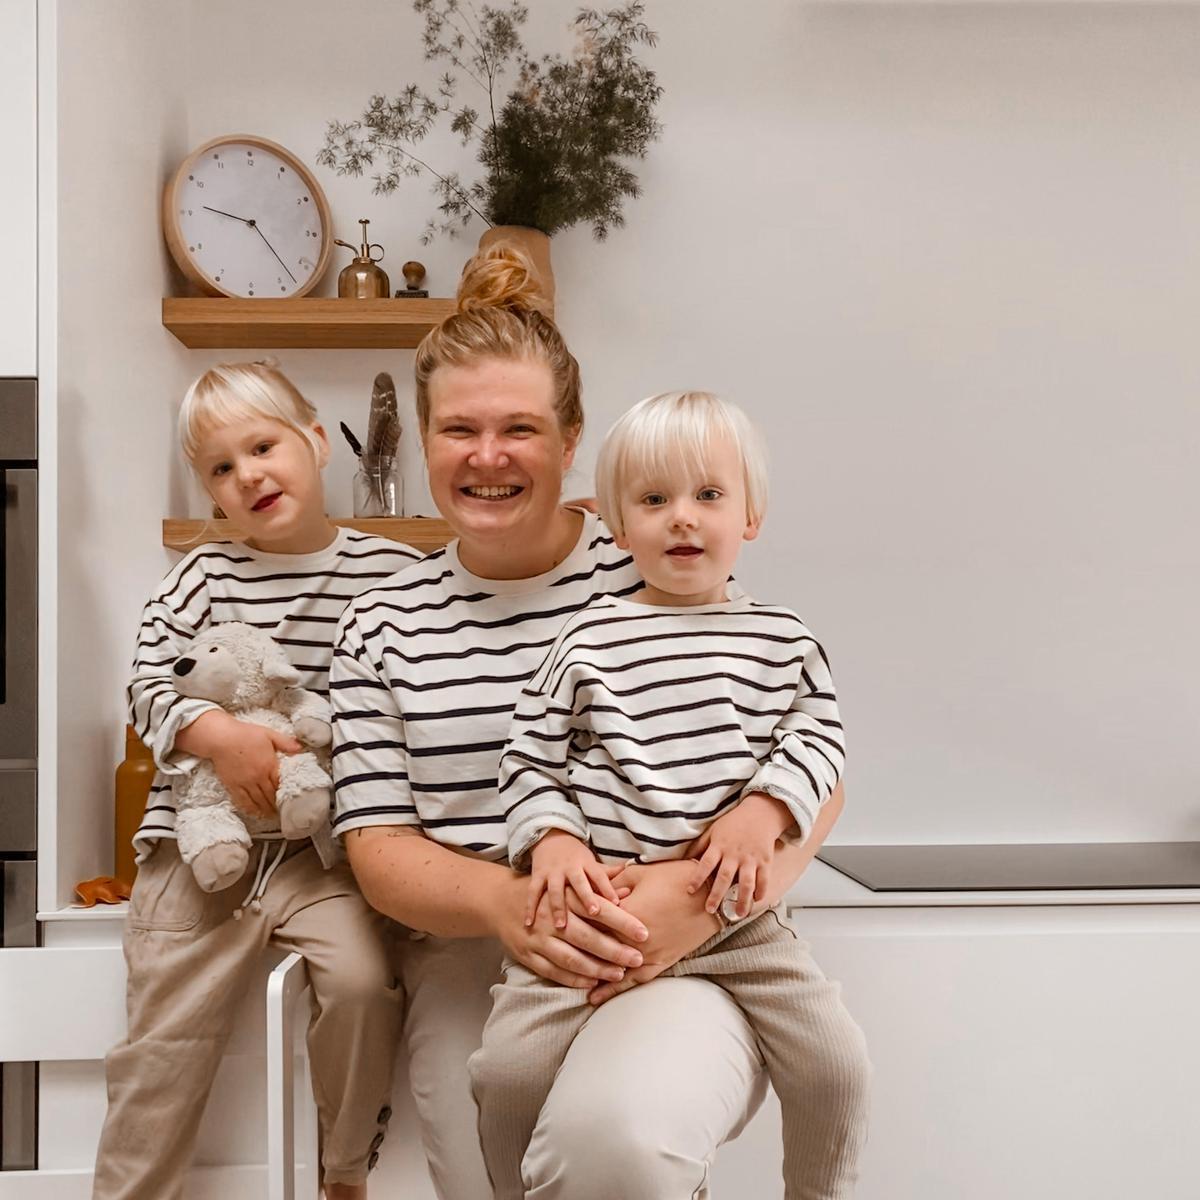 Ervaringsdeskundige Lori, mama van Ellie en Bas, deelt op haar mama-blog haar eigen ervaringen. (GF)